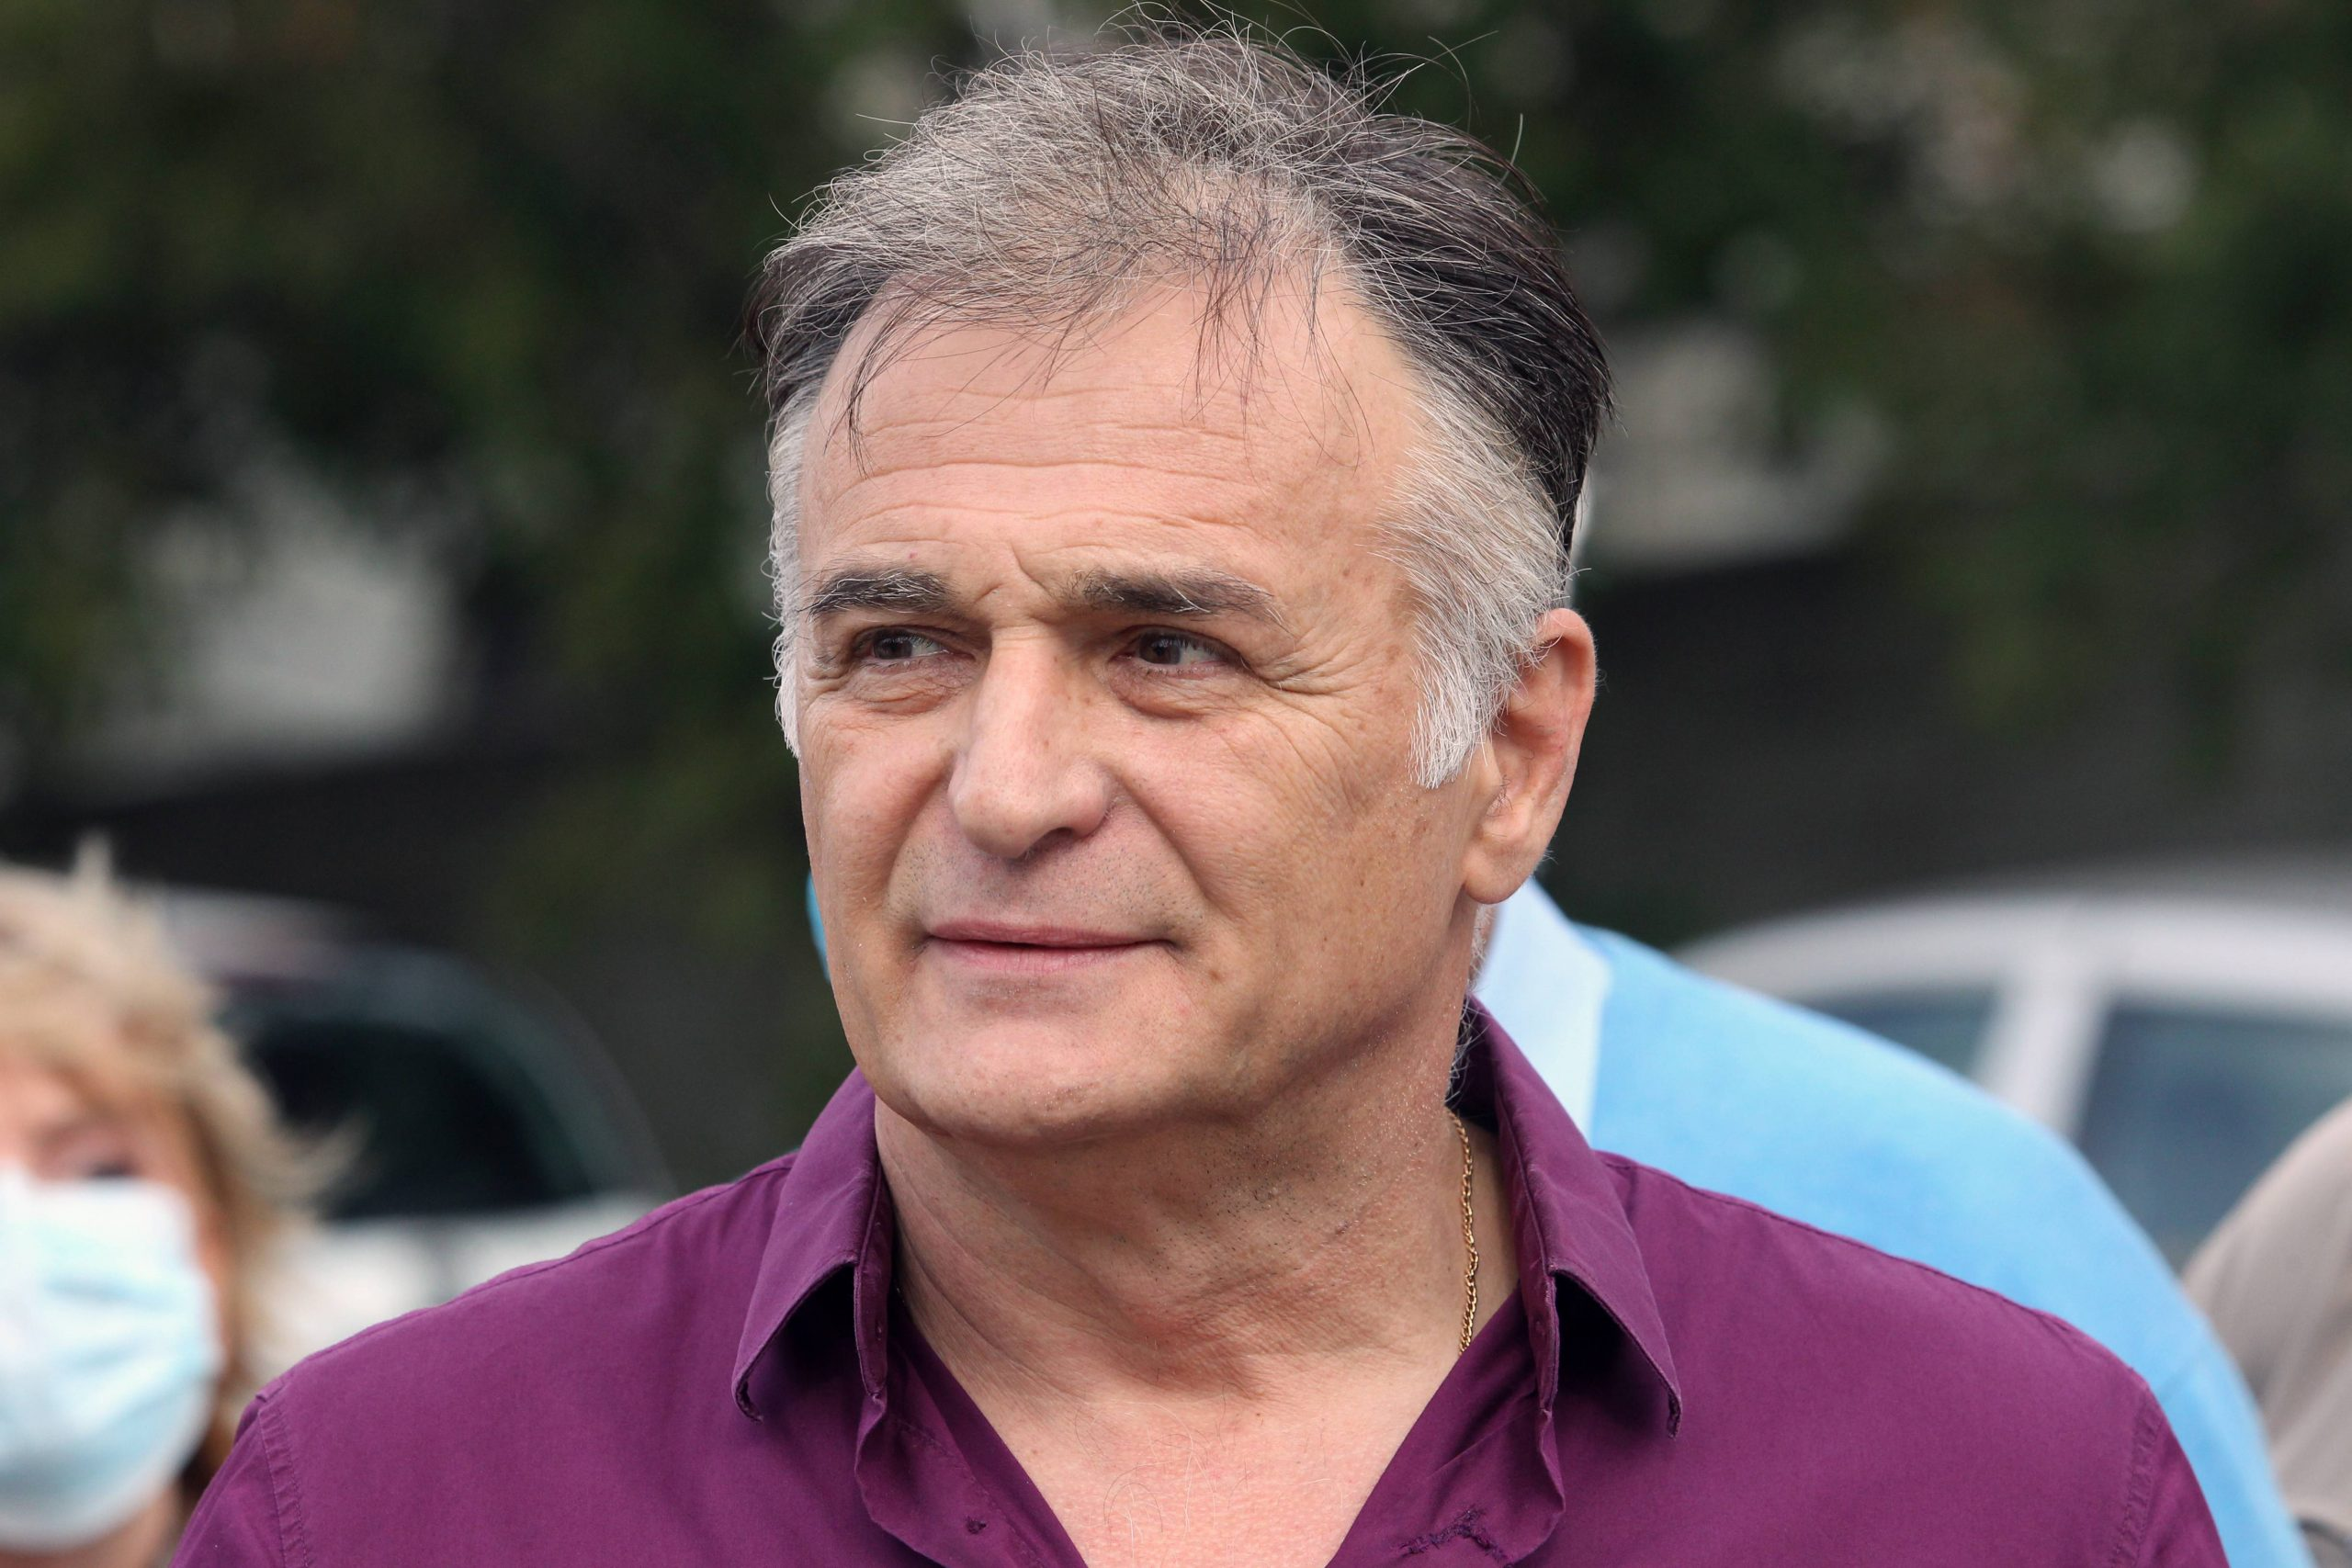 Ministarstvo odbacilo zahtev Branislava Lečića da bude registrovan kao predsednik DS 1